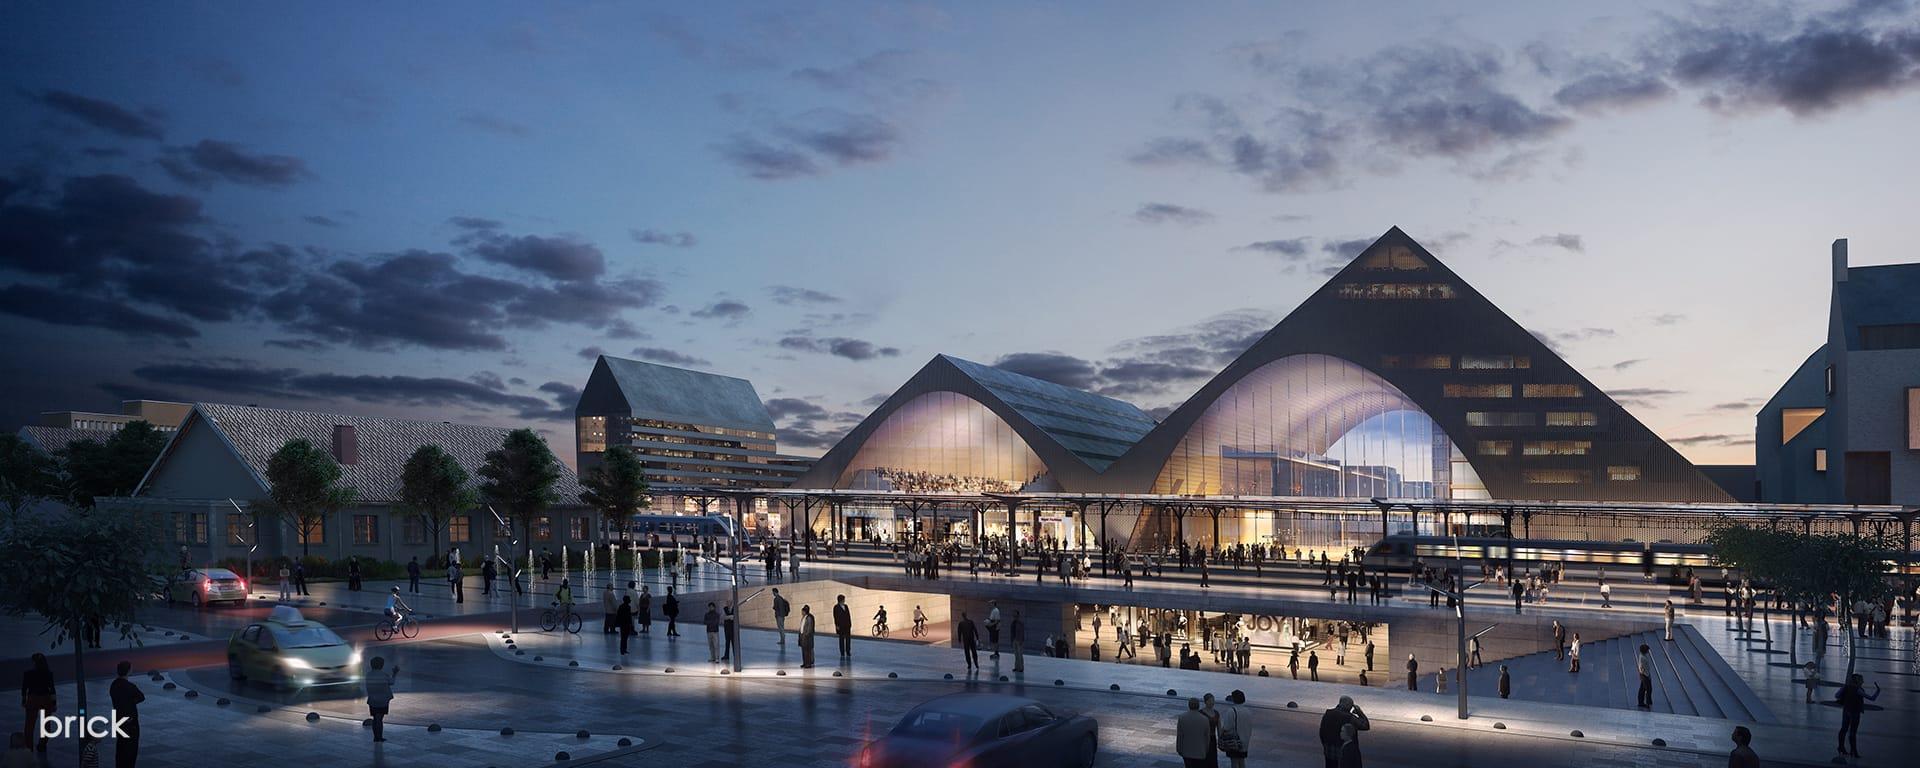 oulu-station-winning-architecture-design